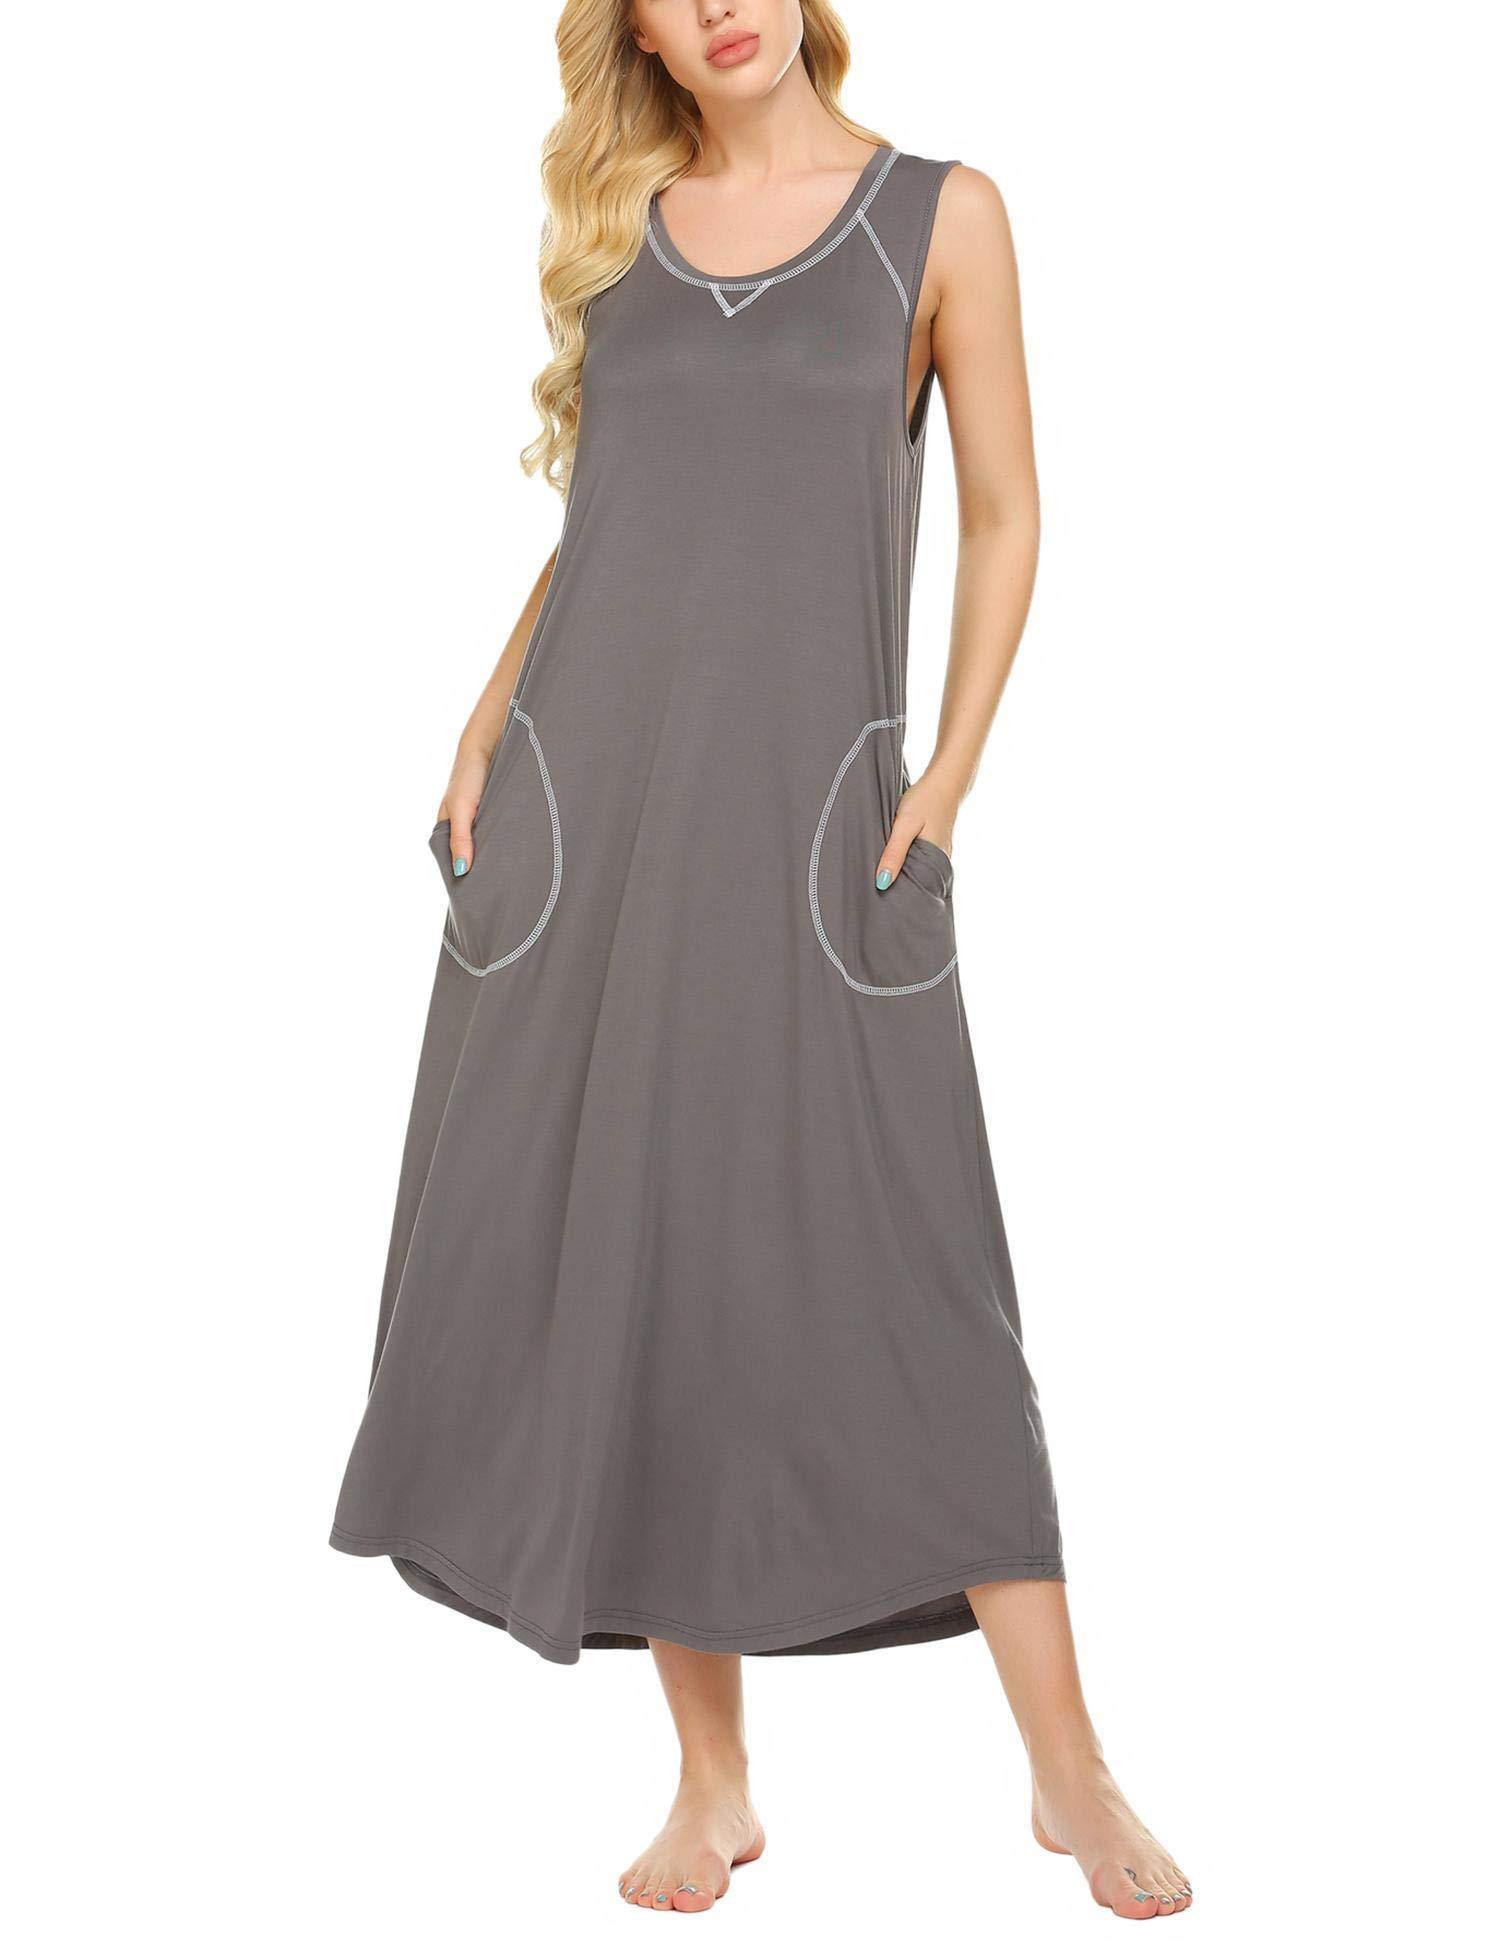 Ekouaer Sleepwear Women's Loungewear Sleeveless Nightshirt Dress Long Nightgown with Pockets S-XXL